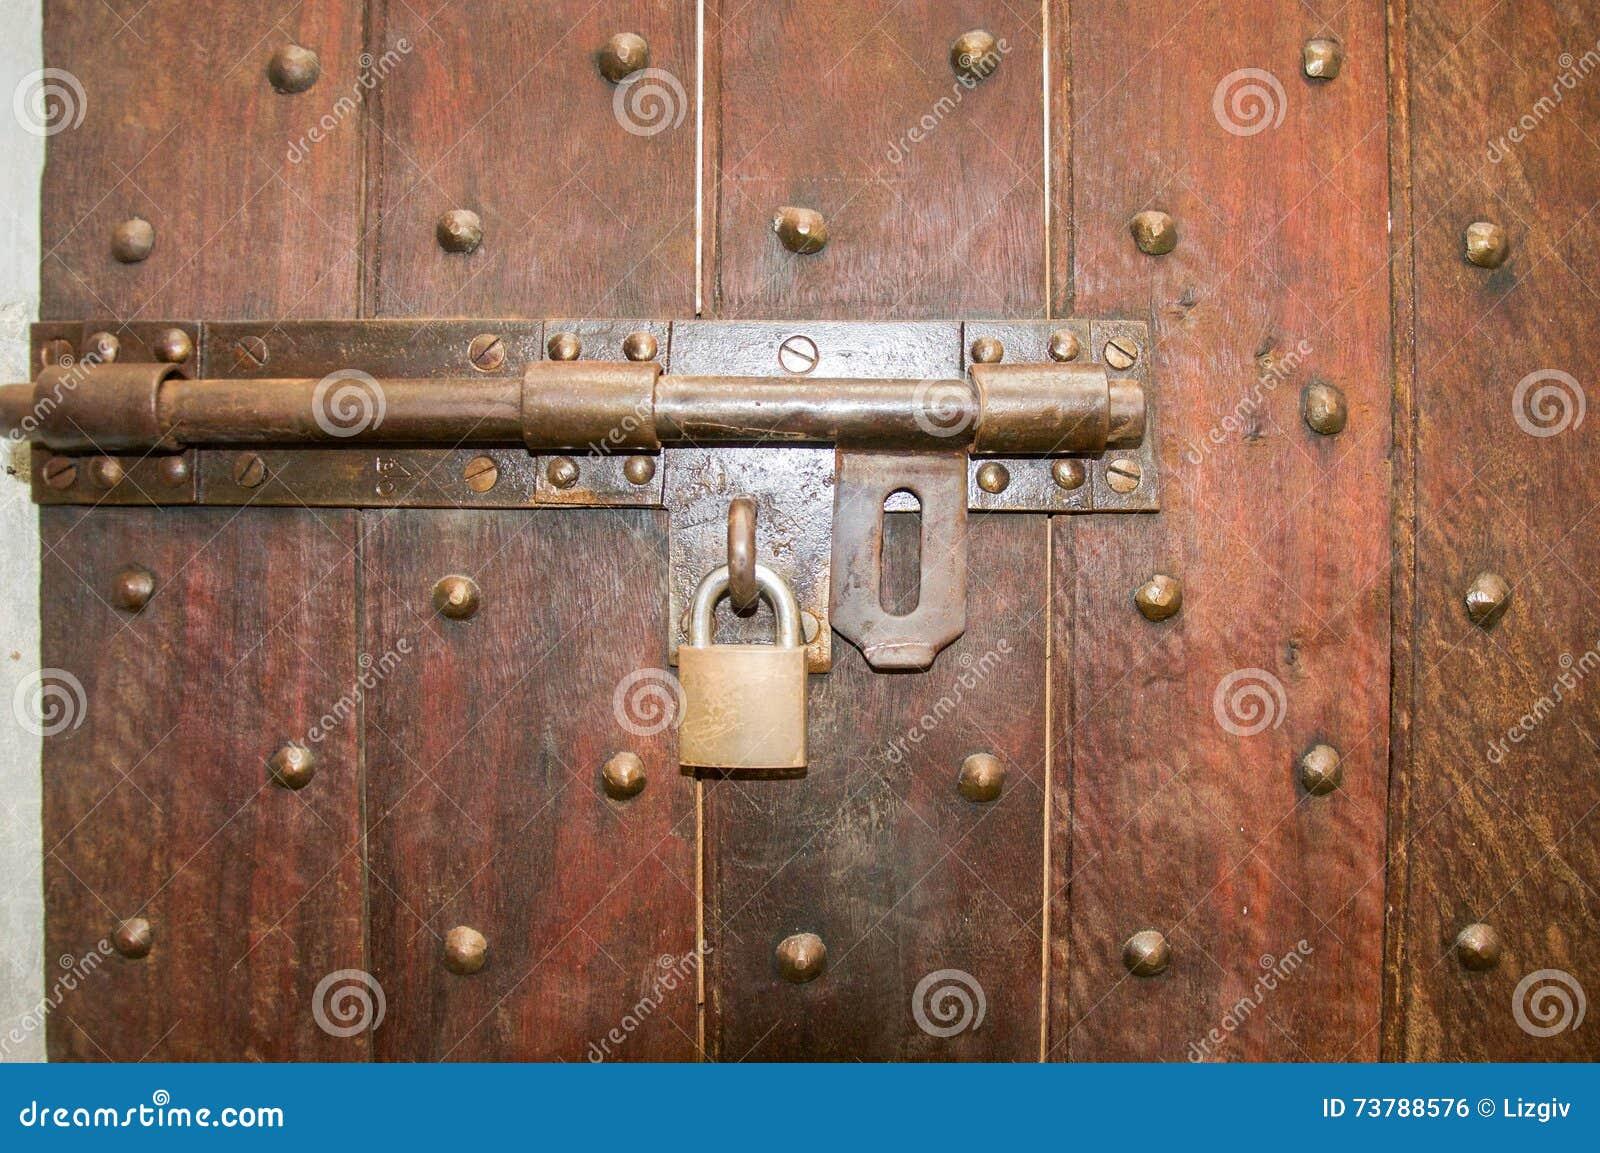 Locked and Bolted Door & Locked and Bolted Door stock photo. Image of embedded - 73788576